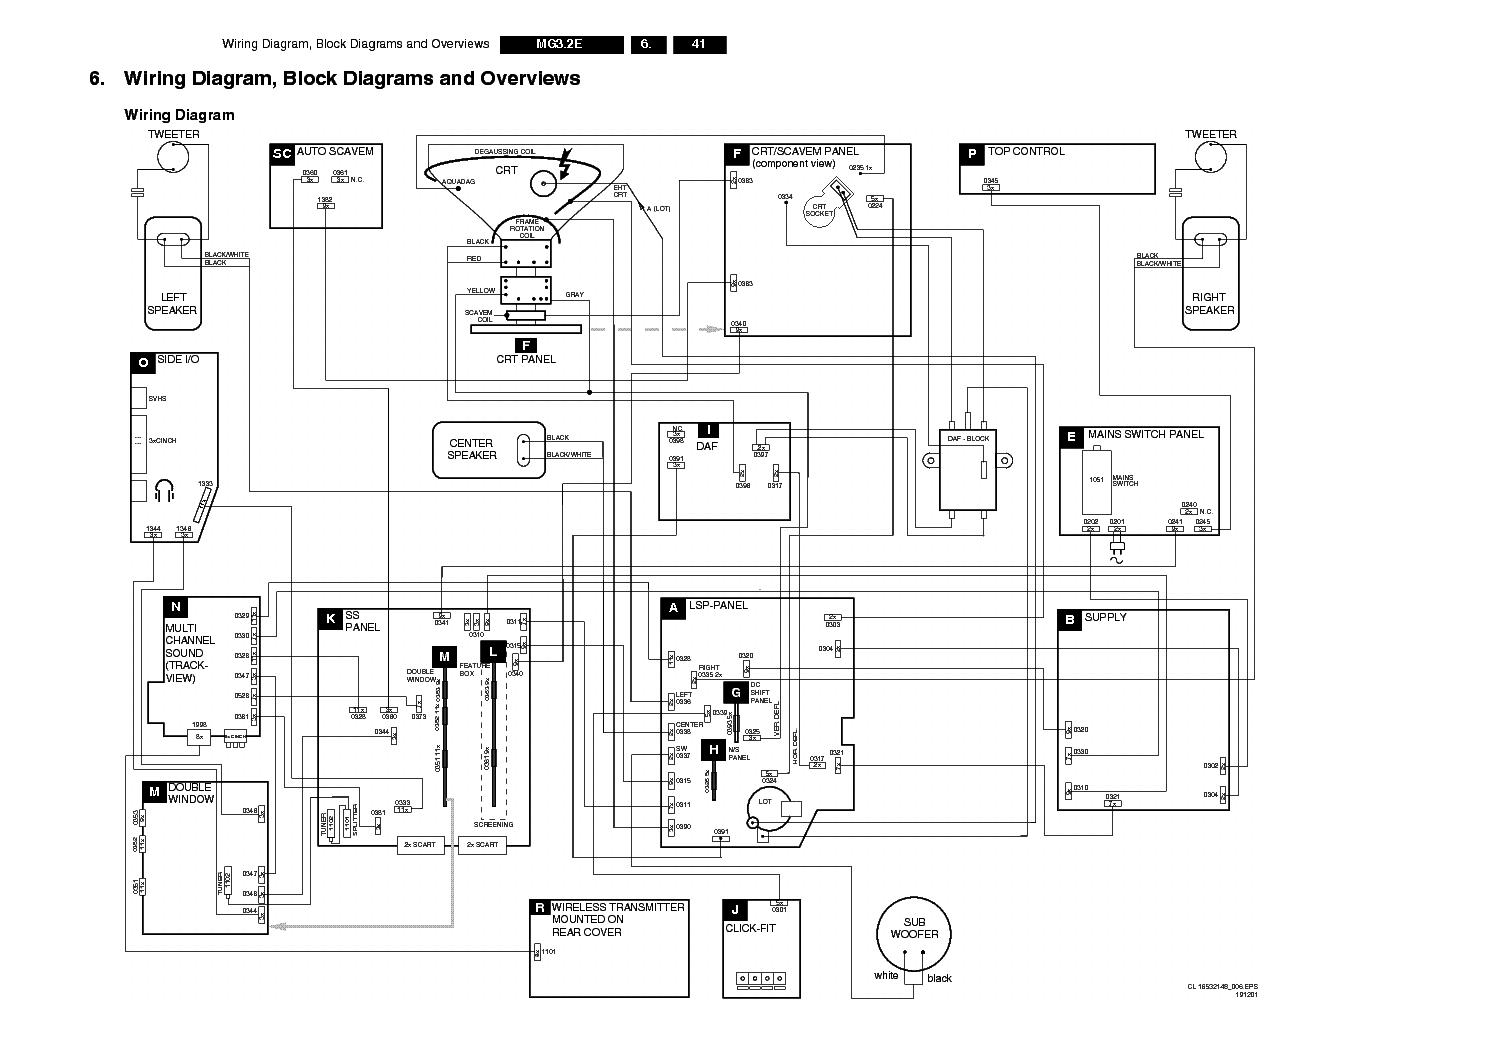 philips chassis q522 2e la service manual download  schematics  eeprom  repair info for